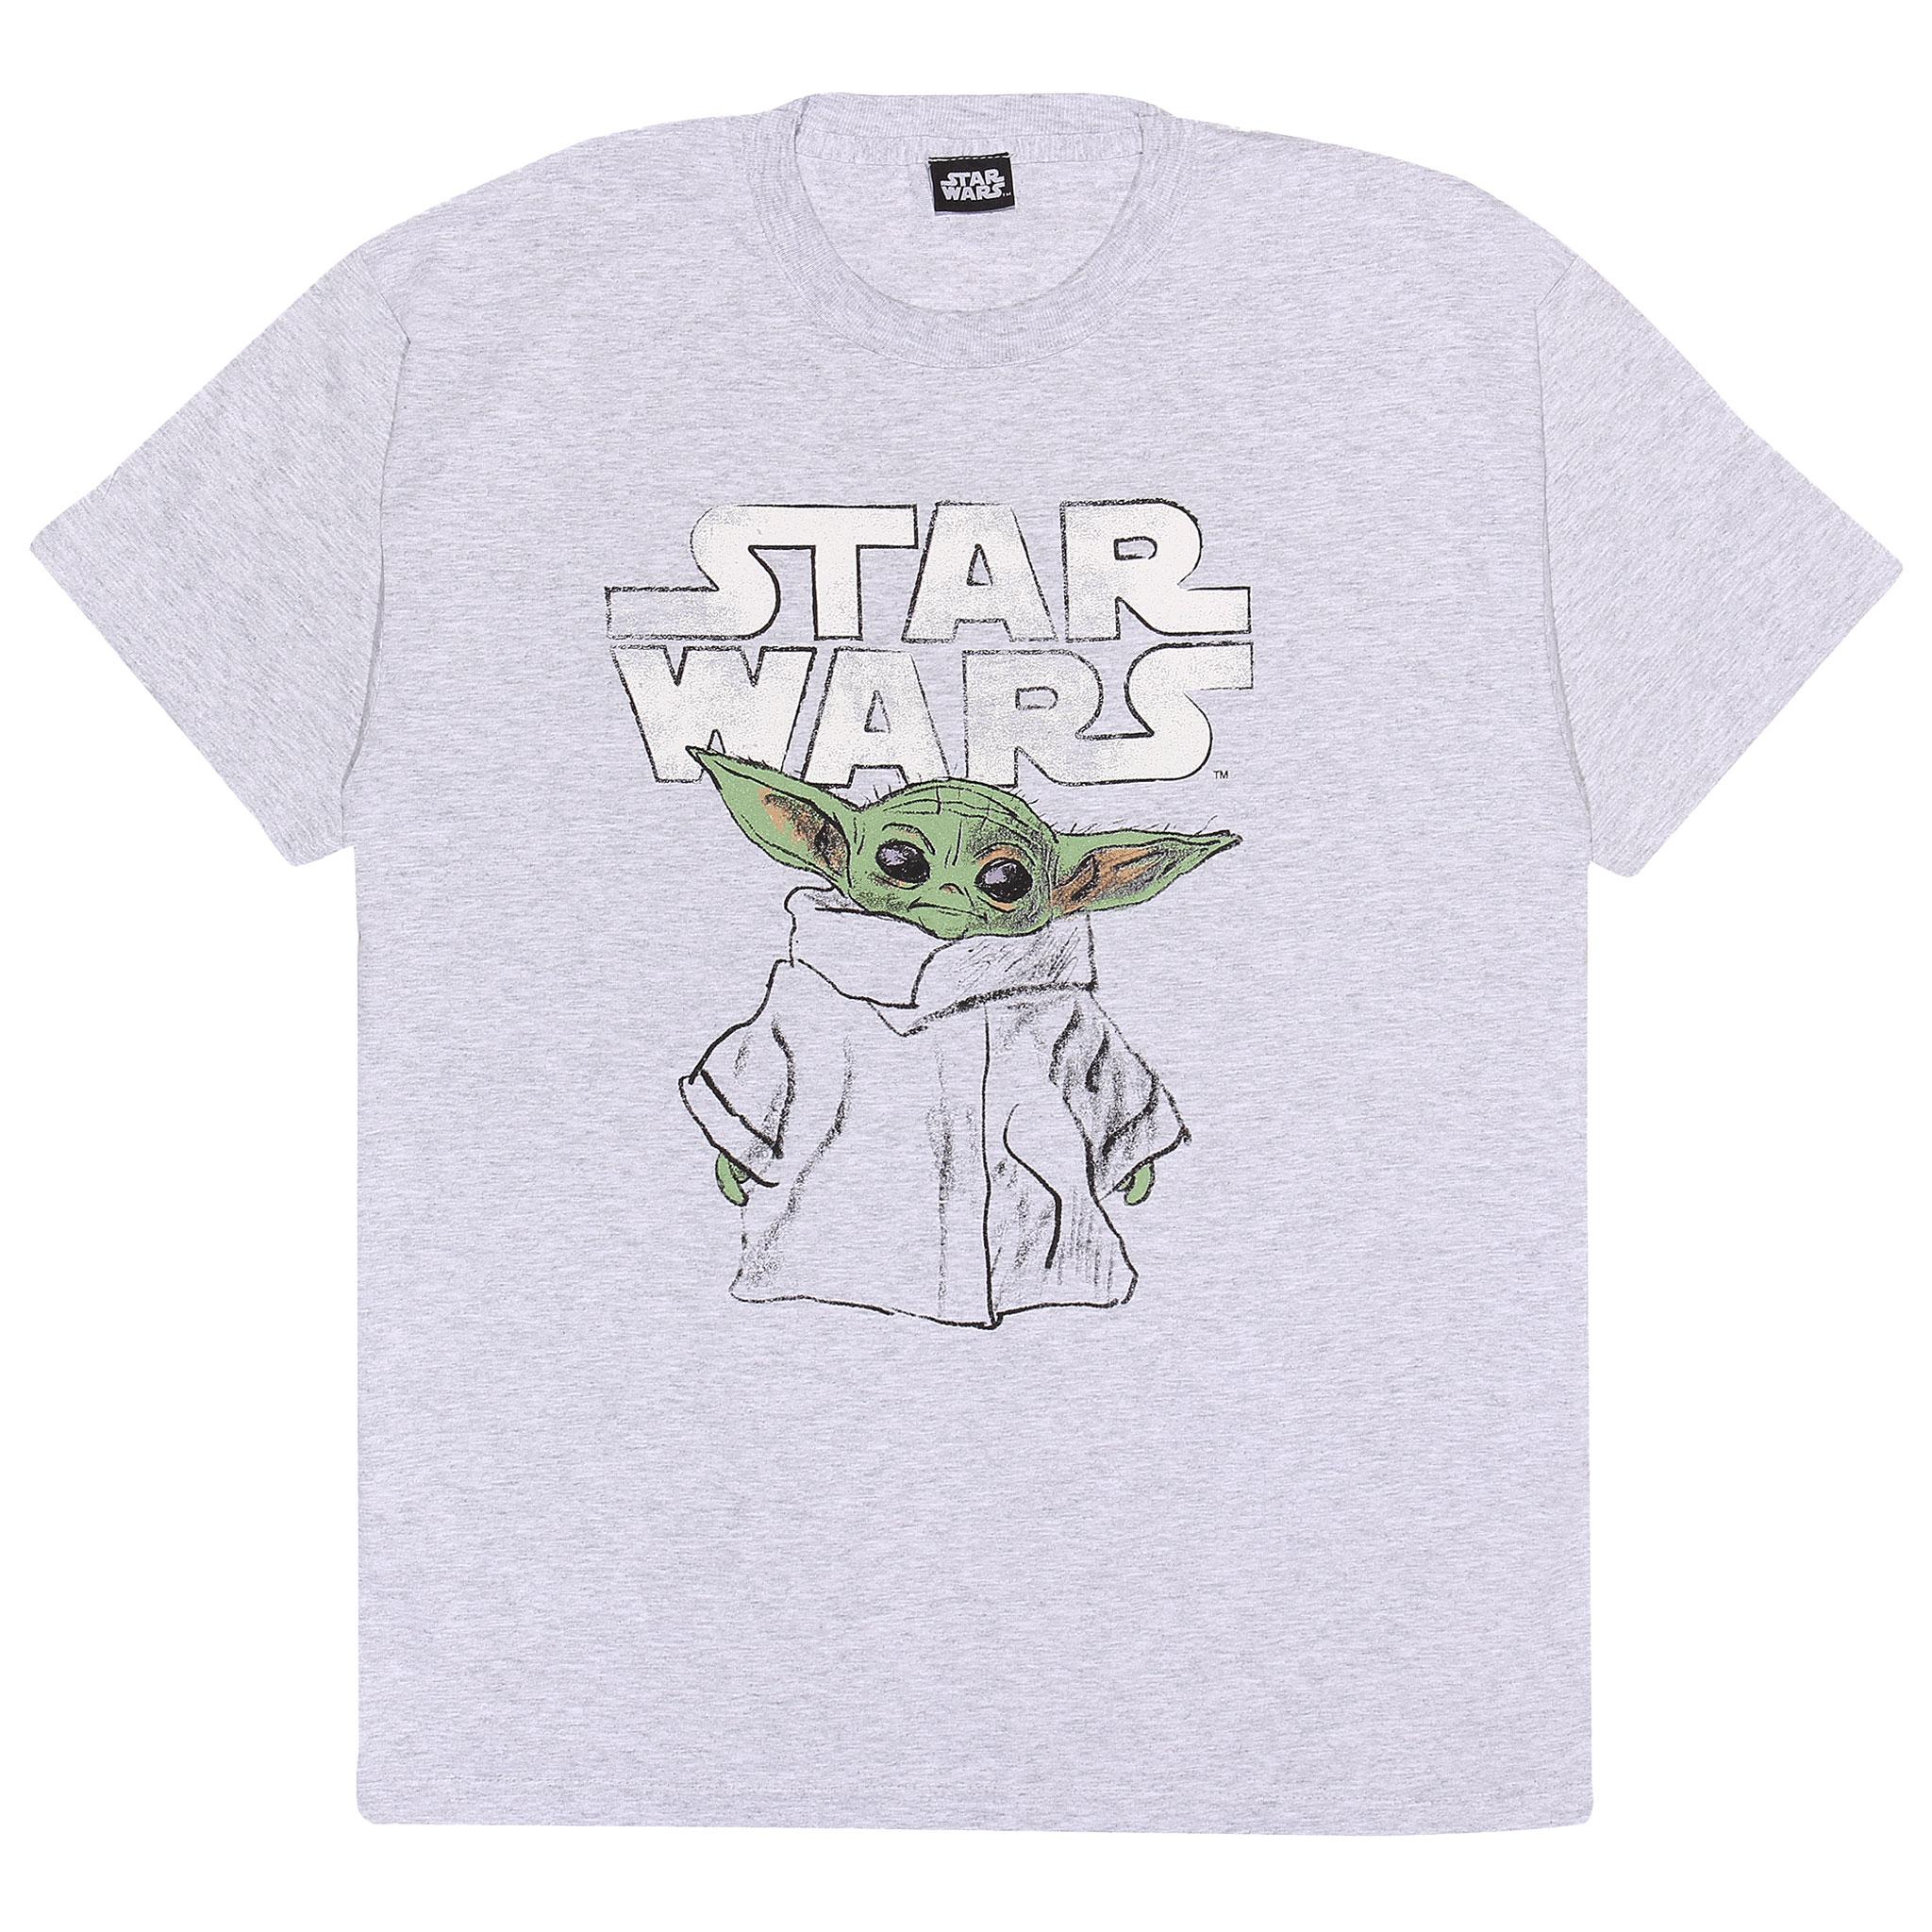 Star Wars Return Of The Jedi Logo T Shirt Mens Licensed Movie Yoda Retro Black